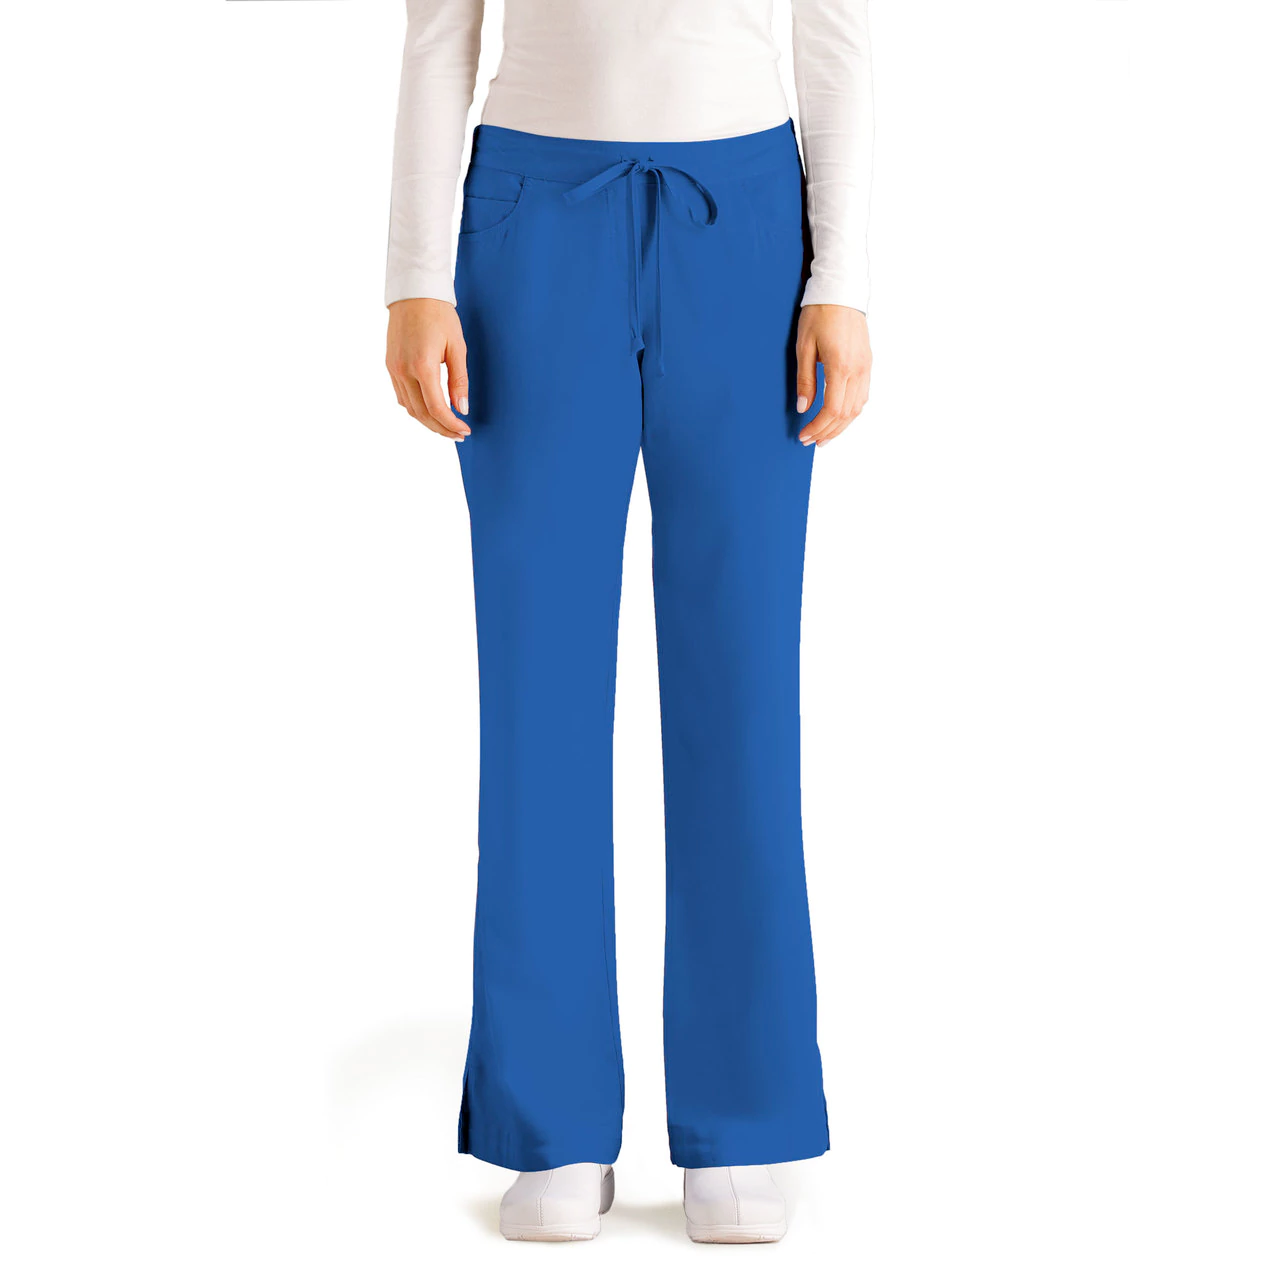 9712ba461eb 4232) Grey's Anatomy Scrubs - 5 Pocket Drawstring Scrub Pants | Jens ...